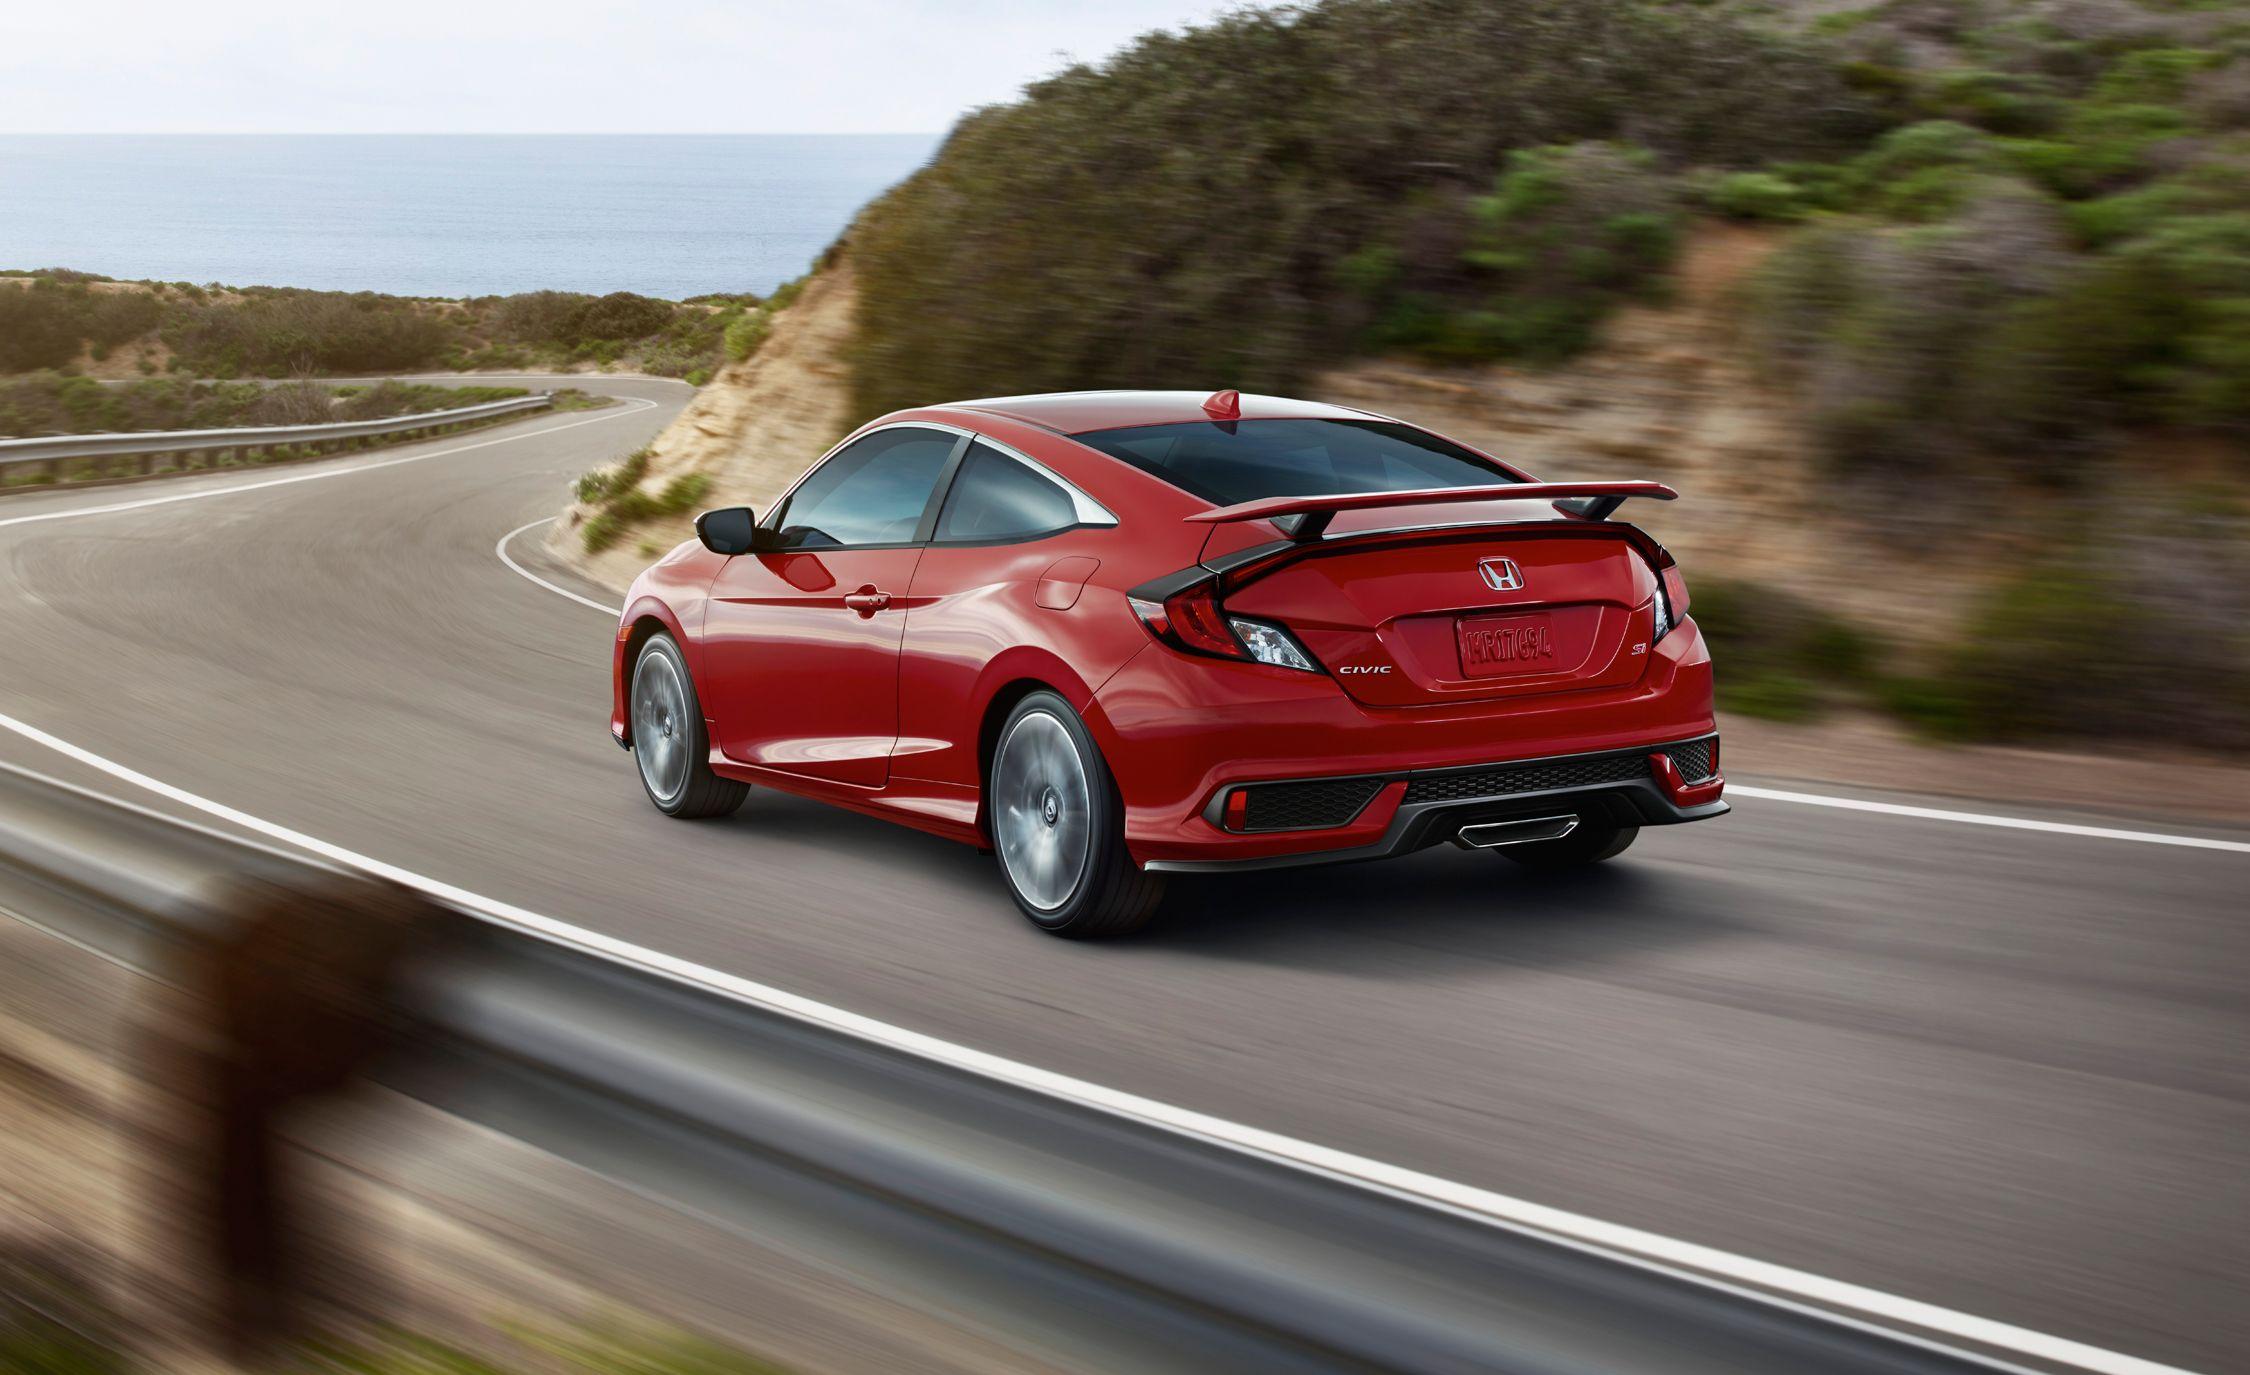 2017 Honda Civic Si Sedan and Coupe Arrive with Fresh Turbocharged Engine